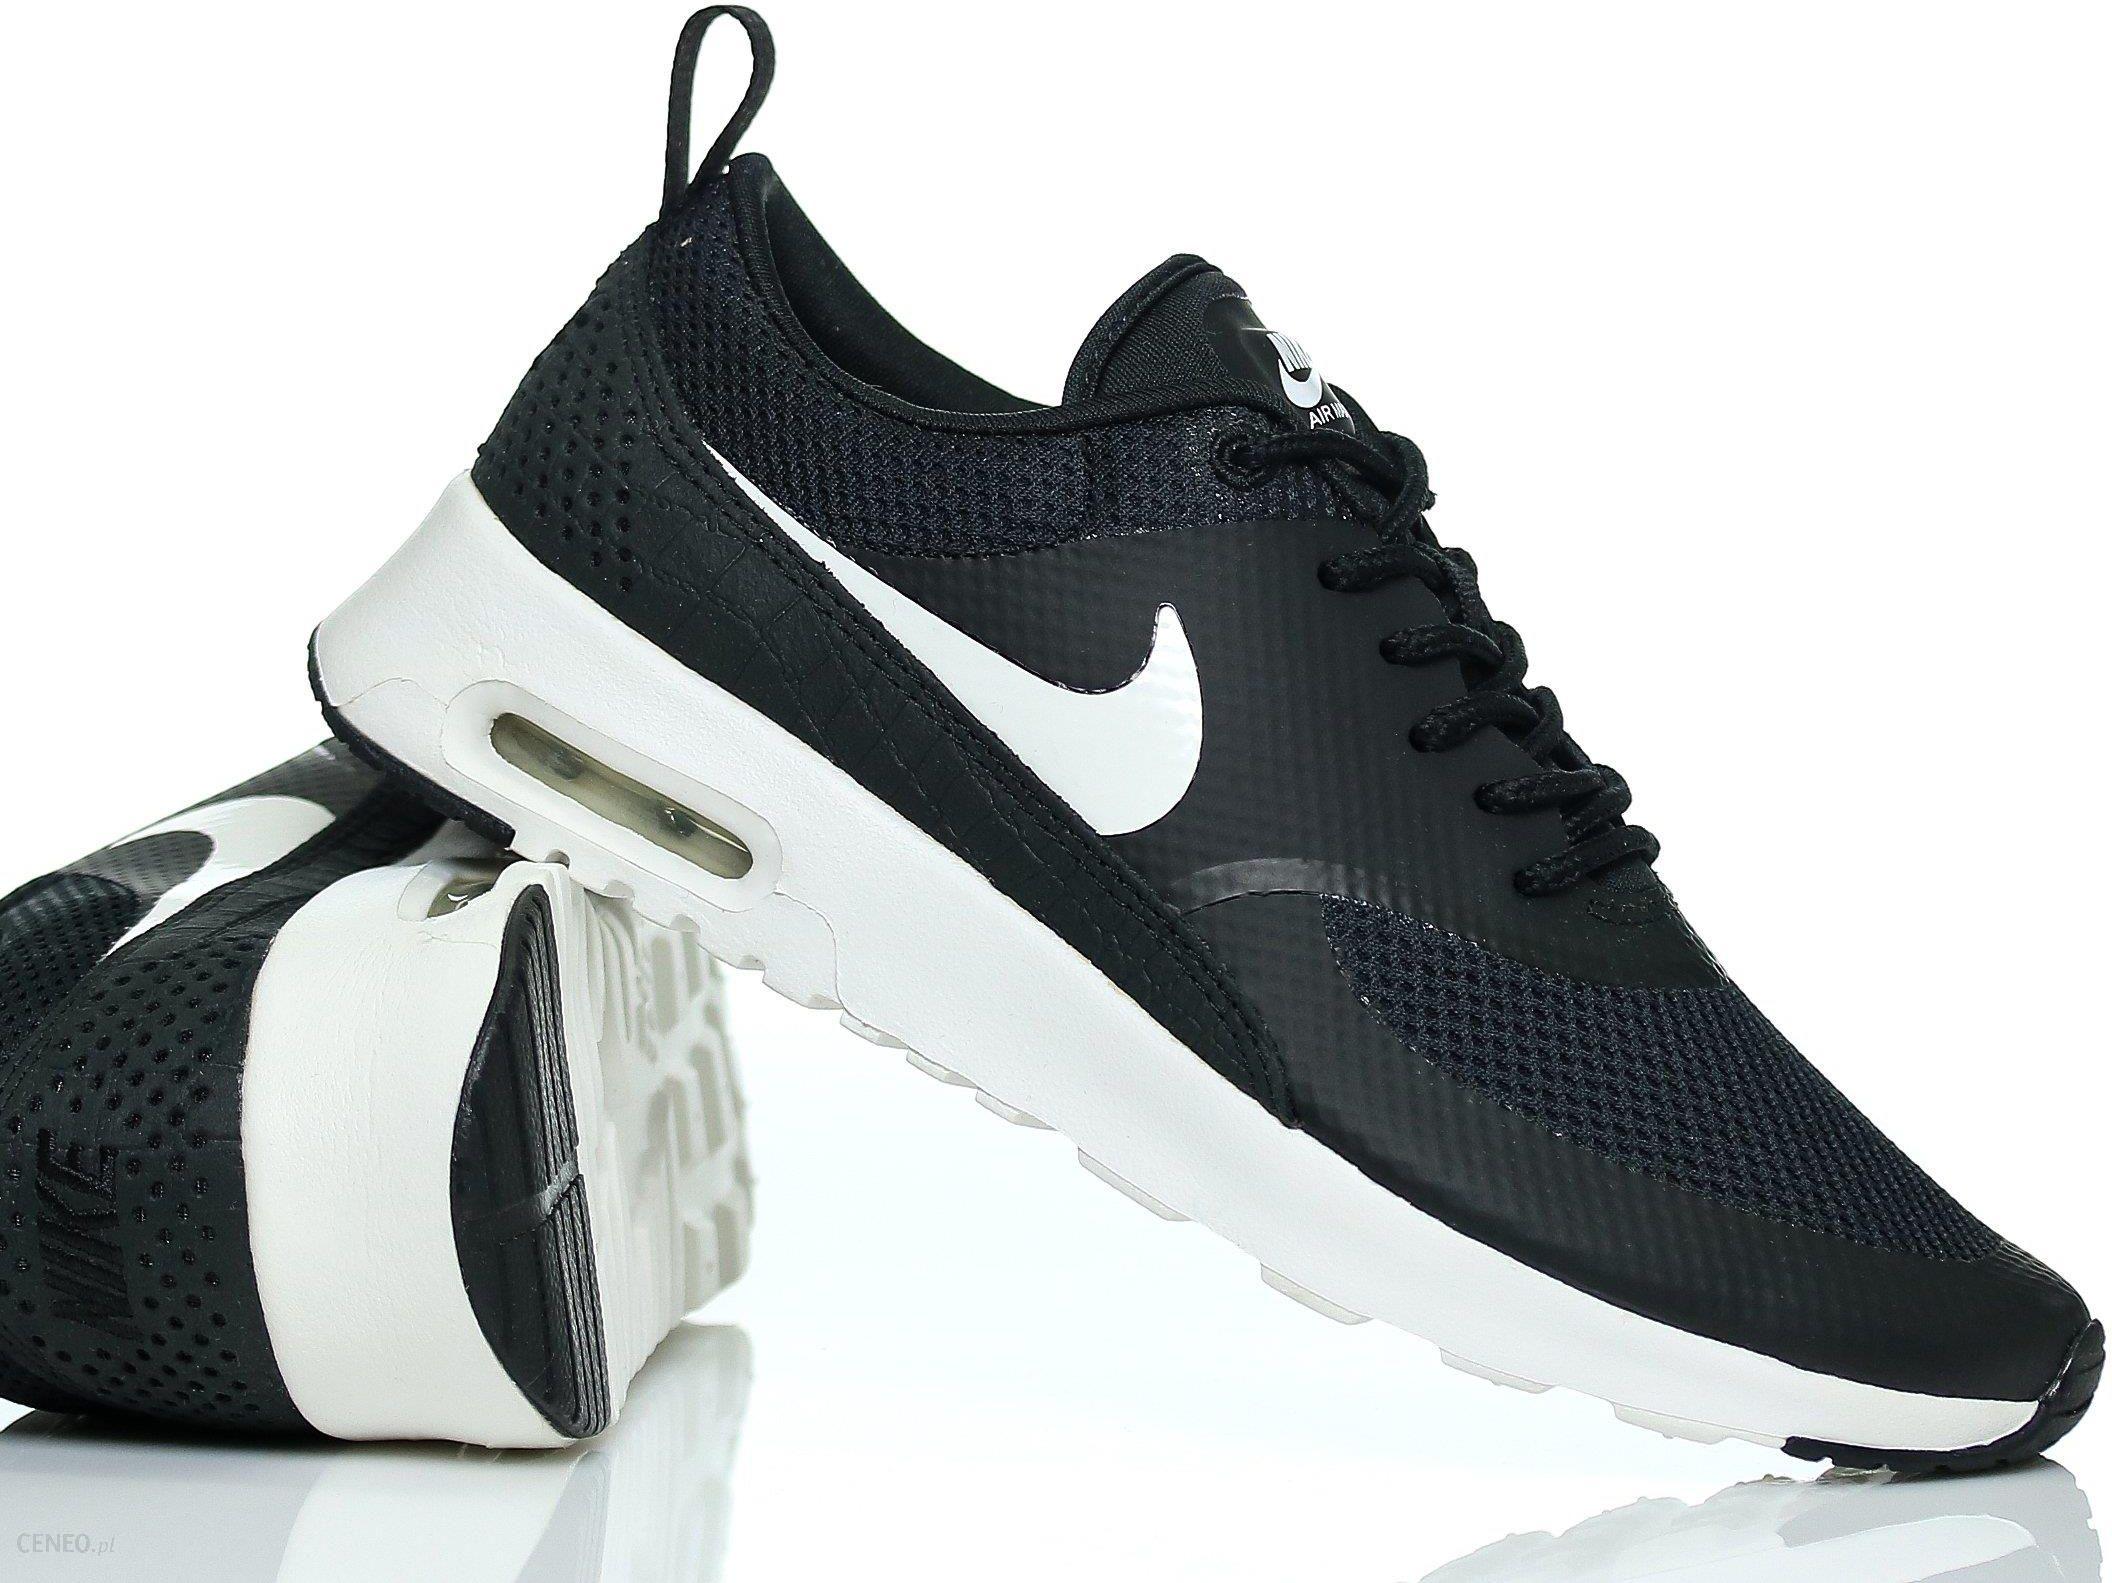 BUTY Męskie Nike Air Max Thea WMNS 599409 020